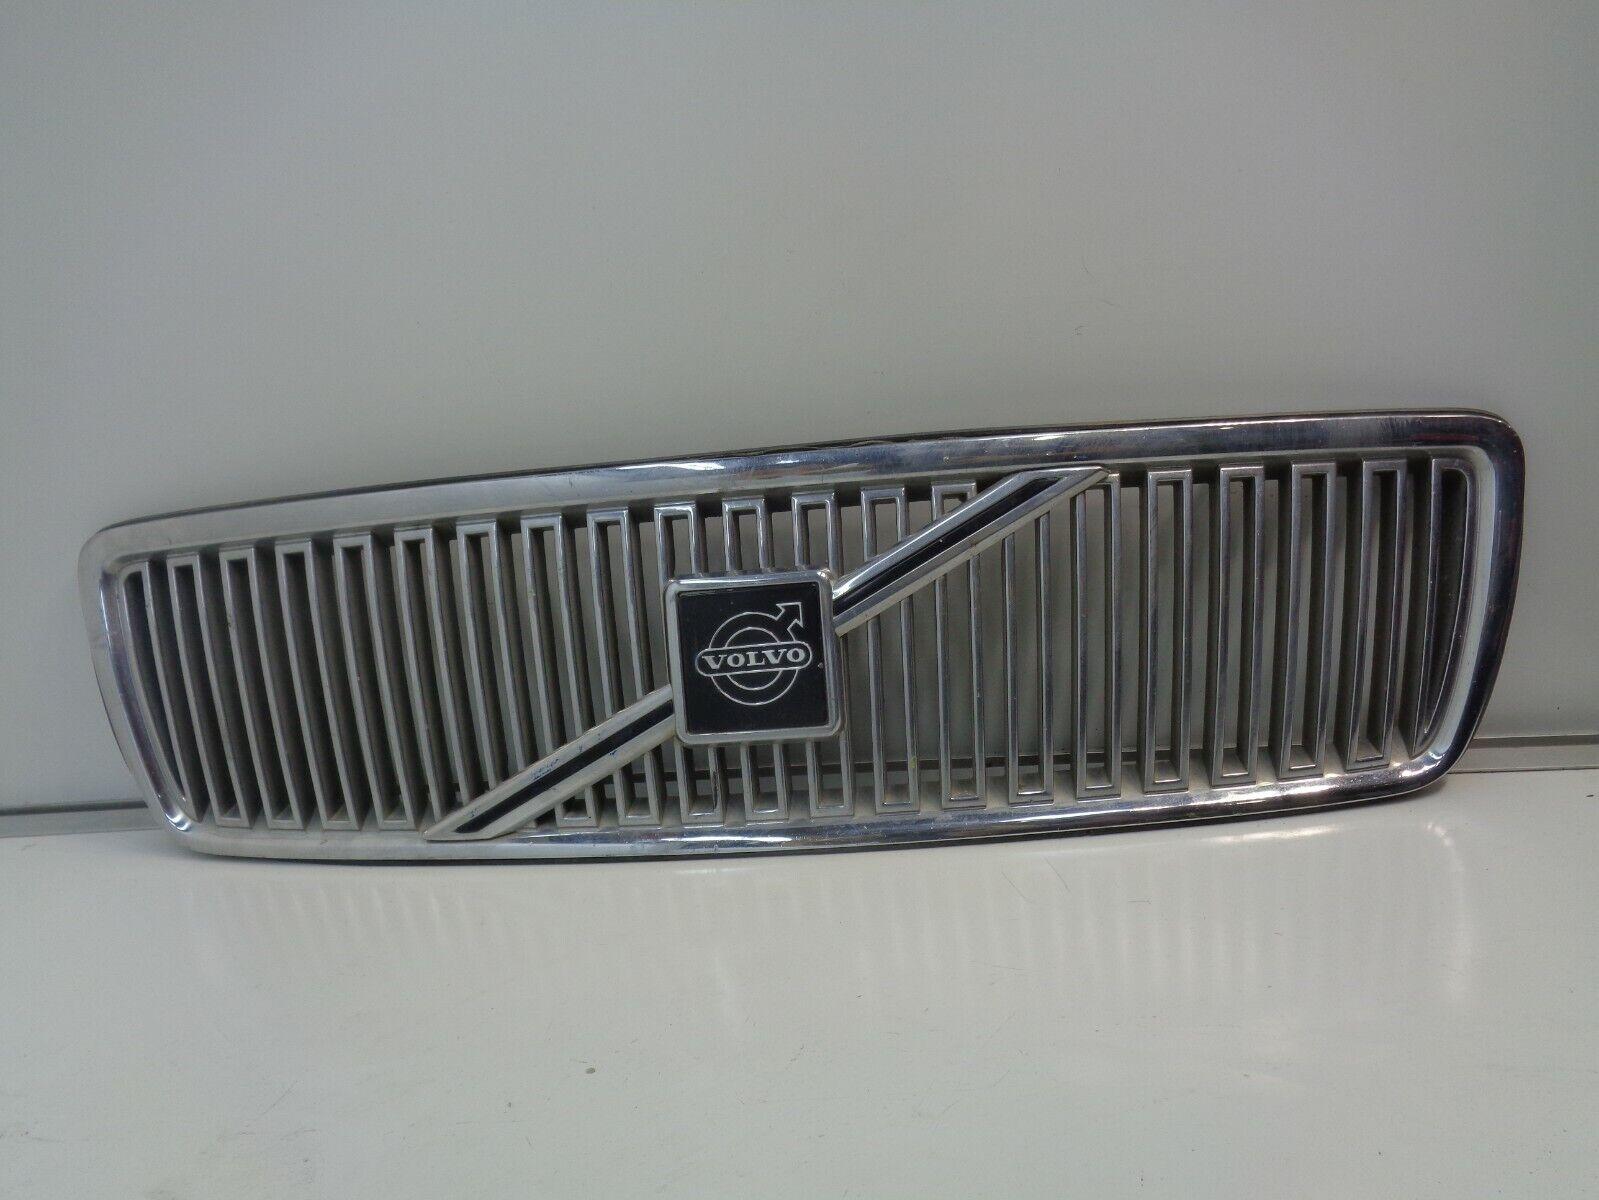 99-04 Volvo C70 4812266 Global Parts Distributors